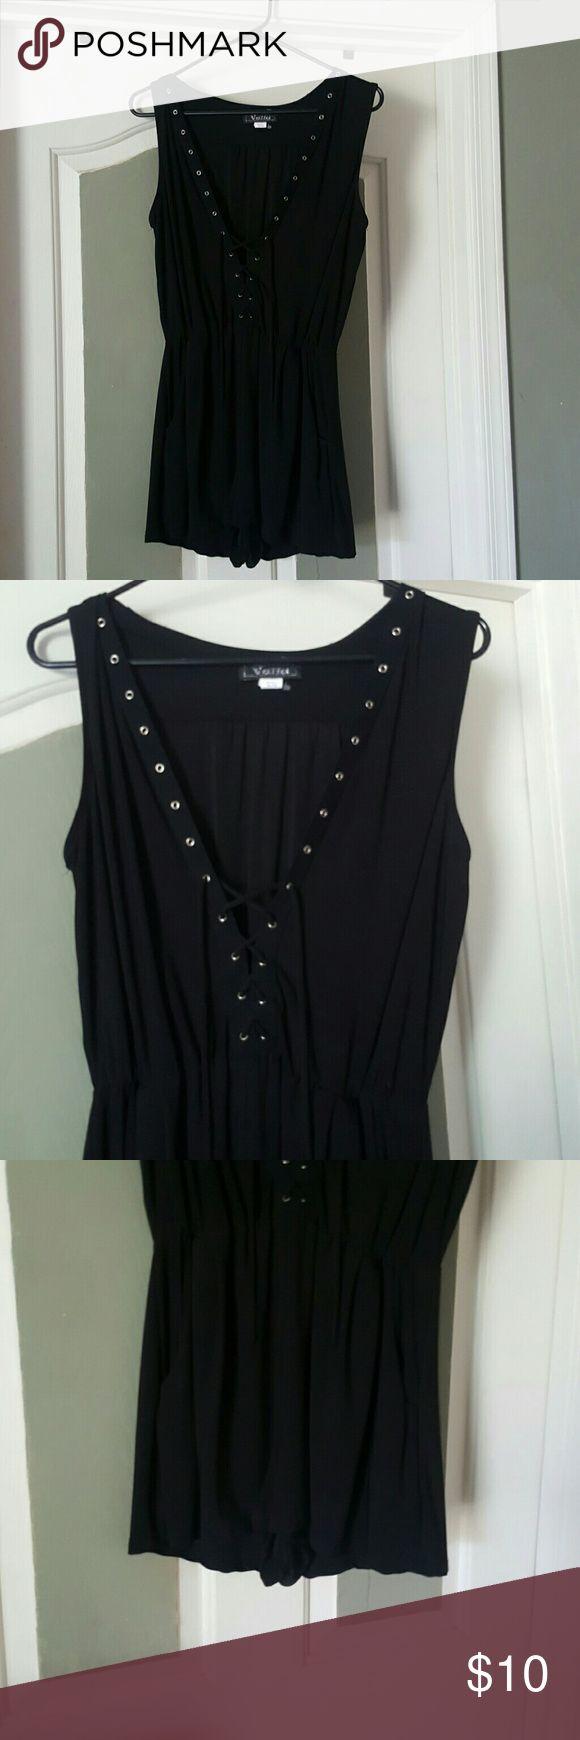 Black Rompers dress Cute short little Black dress Romper, brand new never worn! Junior size XL Dresses Mini